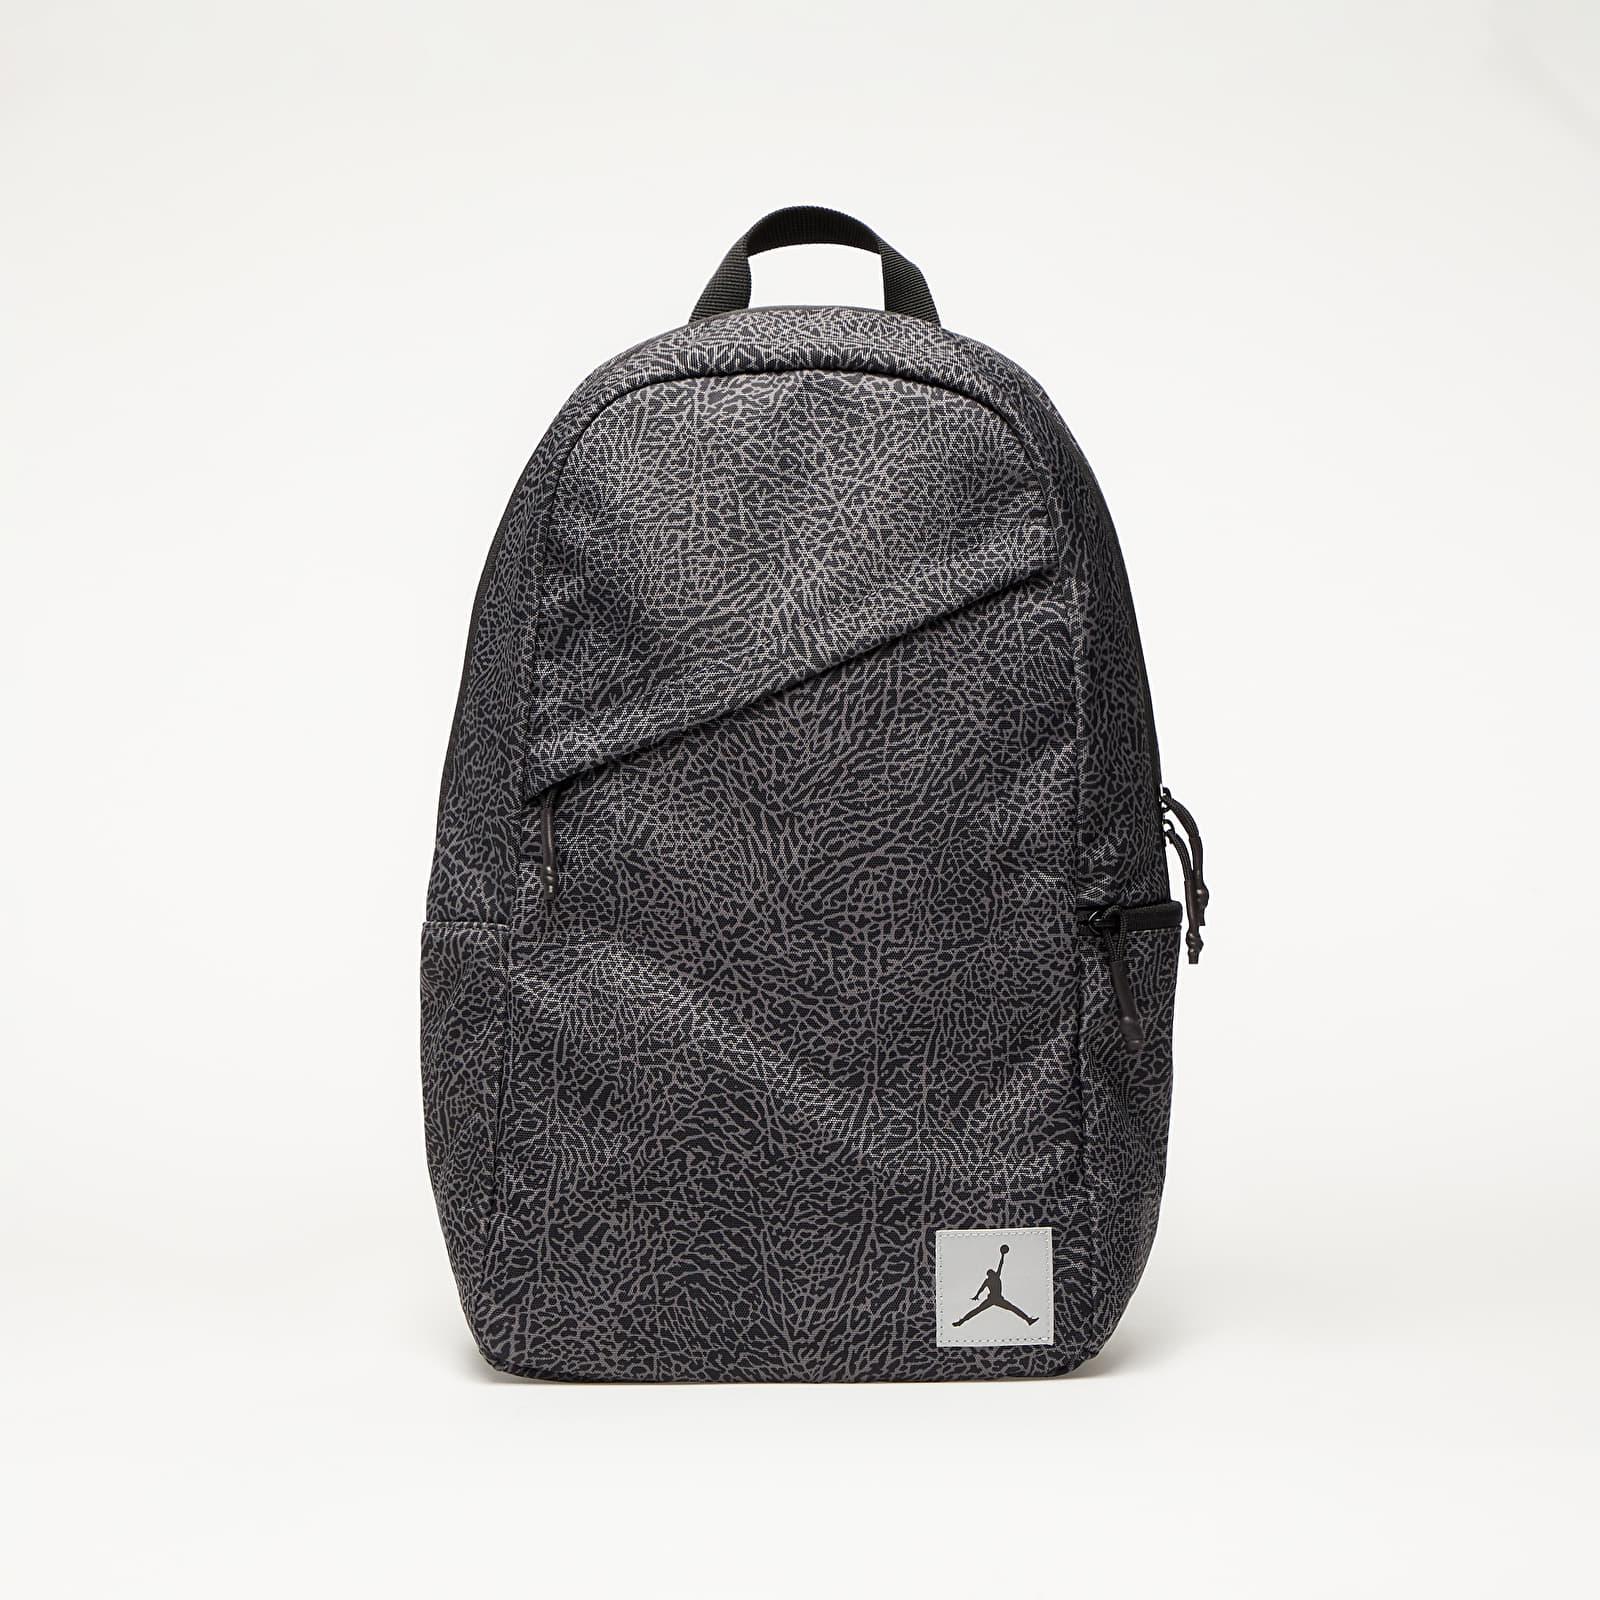 Backpacks Jordan Jan Crossover Pack Black/ Anthracite